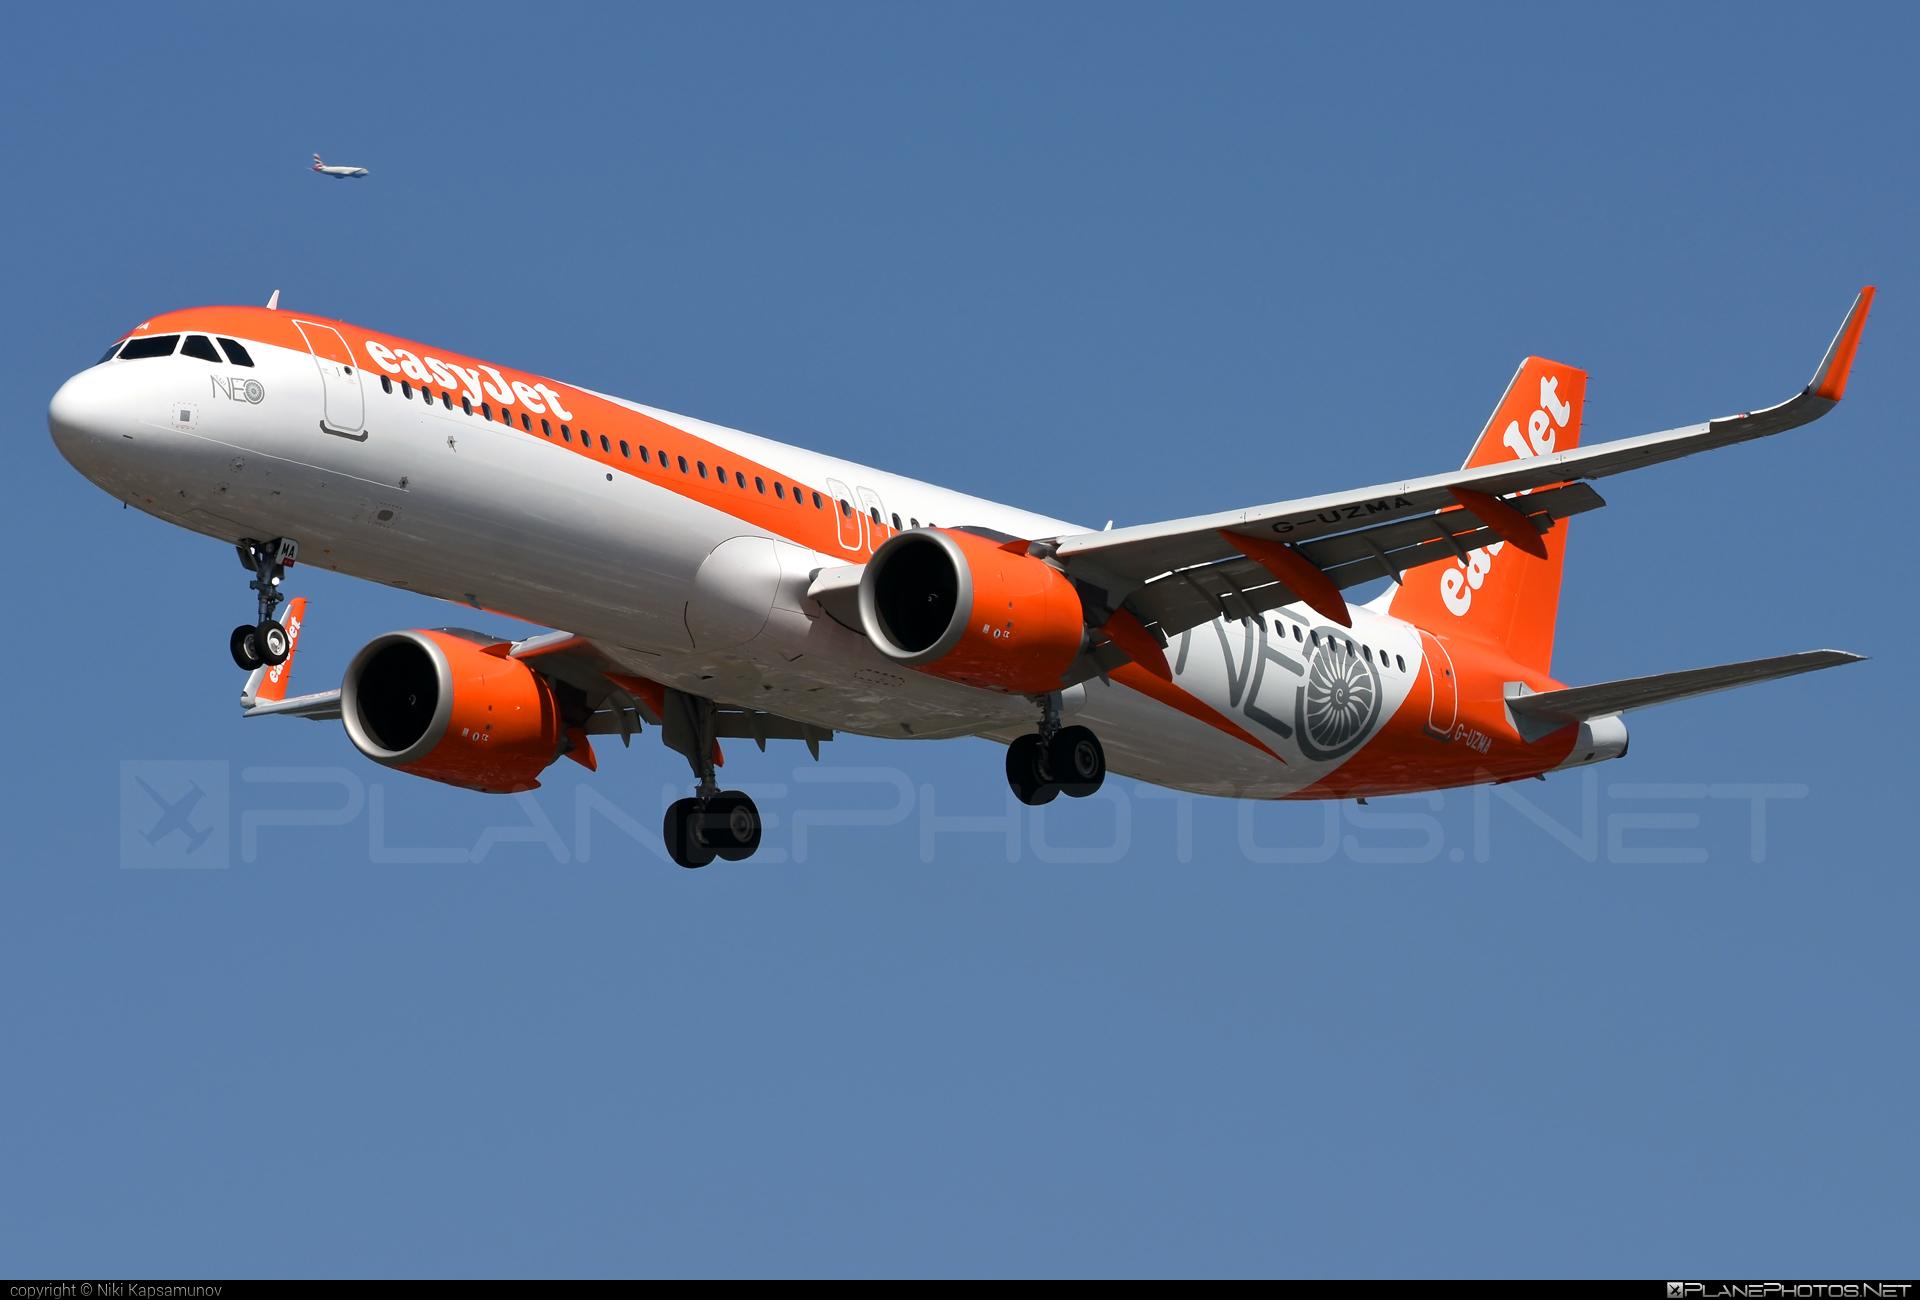 easyJet Airbus A321-251NX - G-UZMA #a320family #a321 #a321neo #airbus #airbus321 #airbus321lr #easyjet